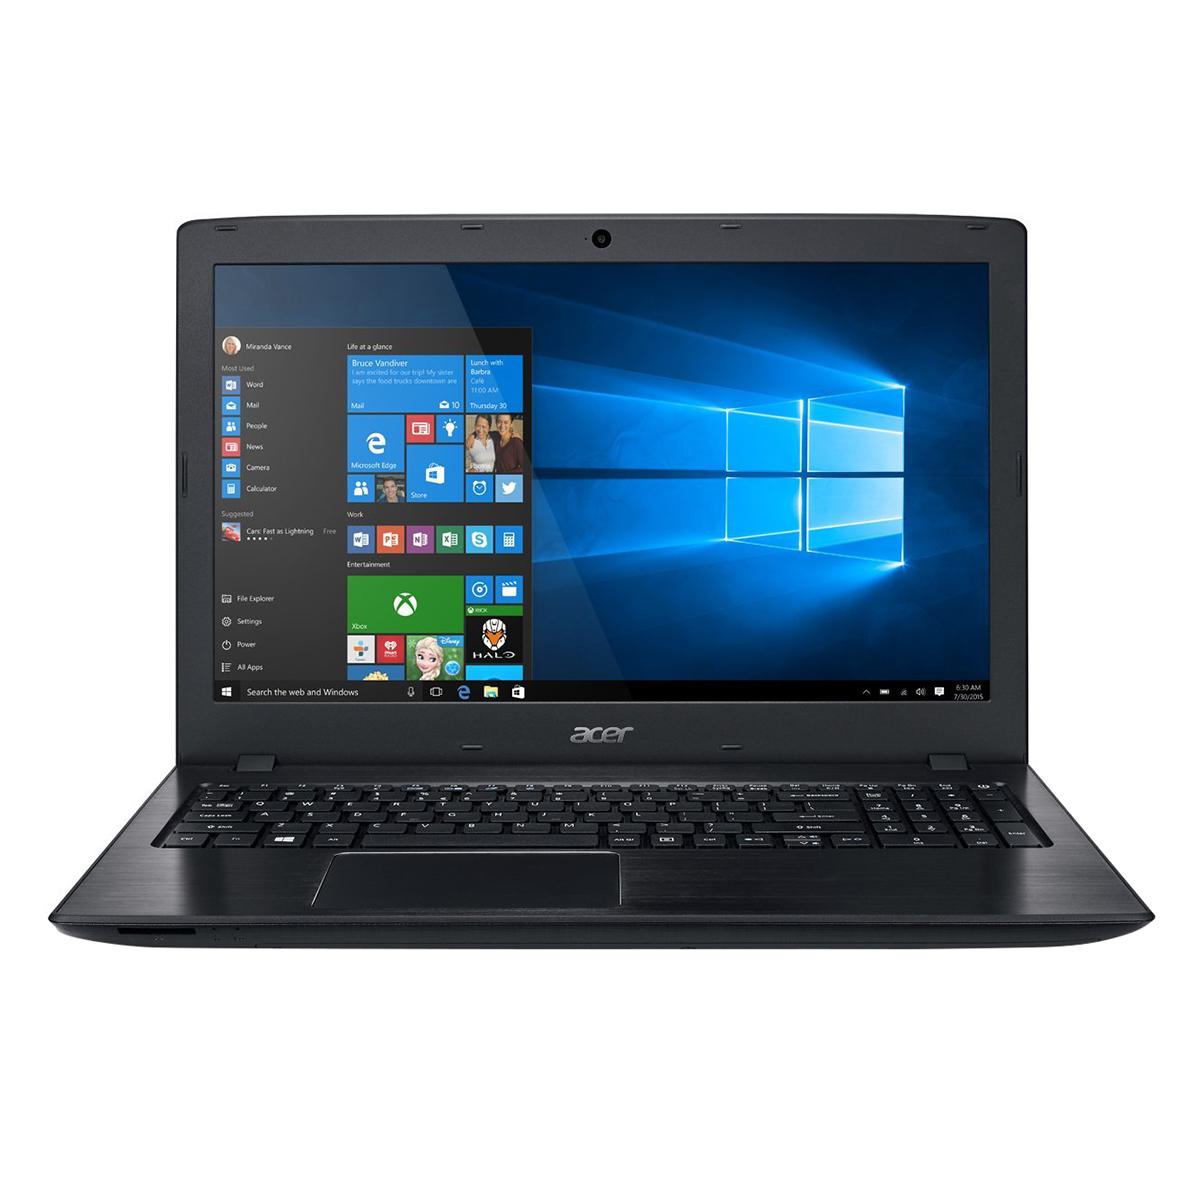 Laptop Acer E5-575G-39QW NX.GDWSV.005 Core i3-7100U